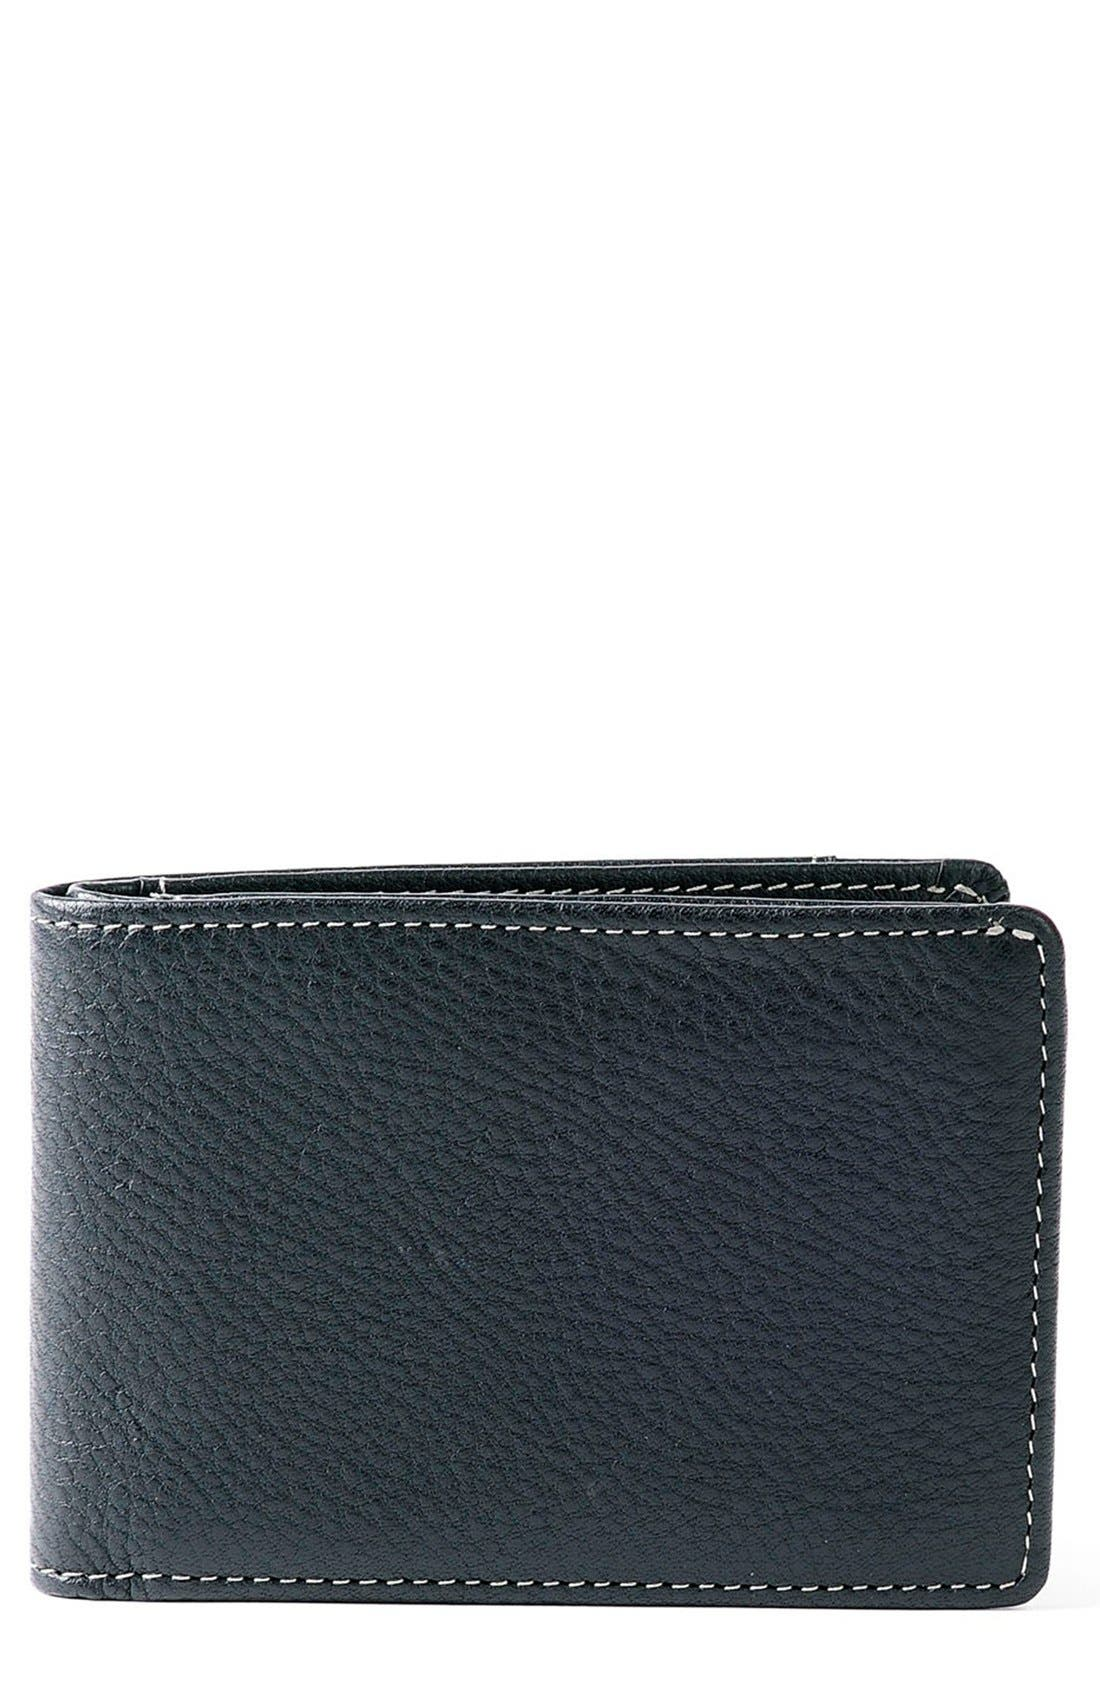 'Tyler' RFID Slimster Wallet,                         Main,                         color, BLACK